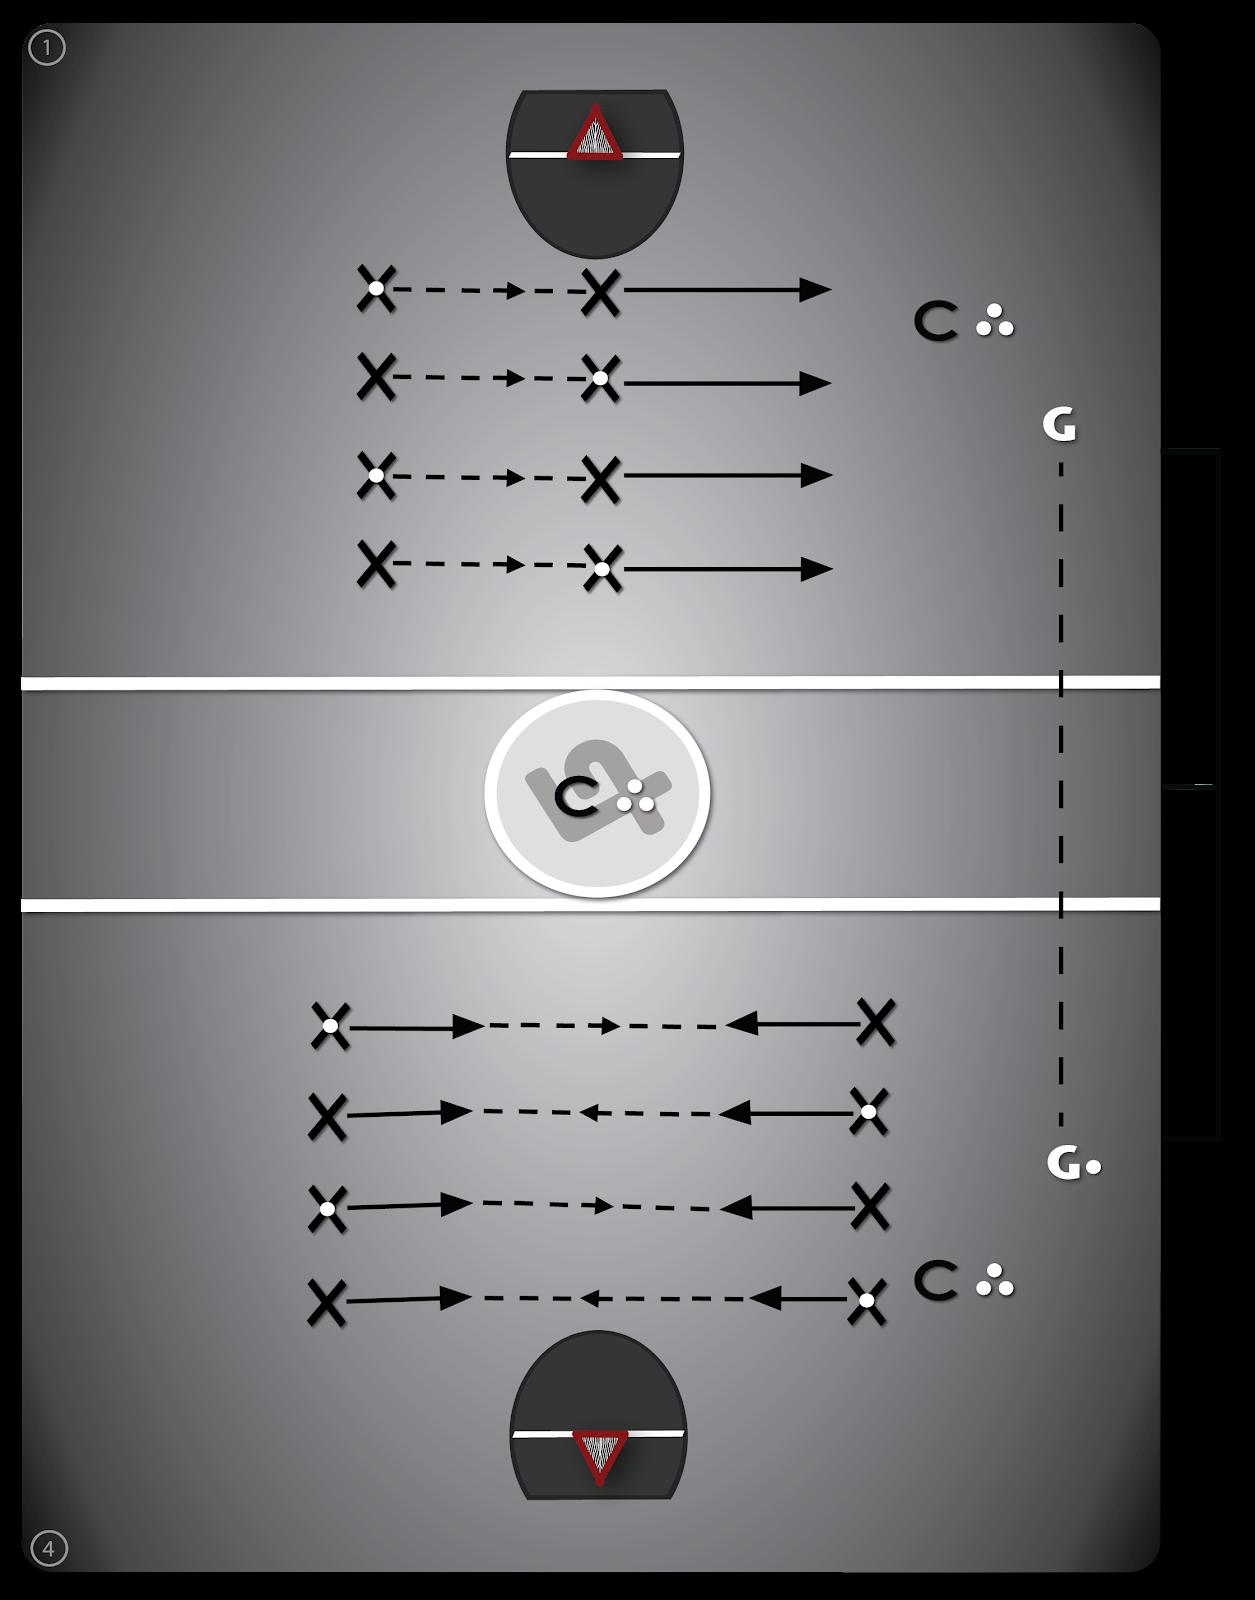 Lacrosse diagram drill #2 - Partner Passing.